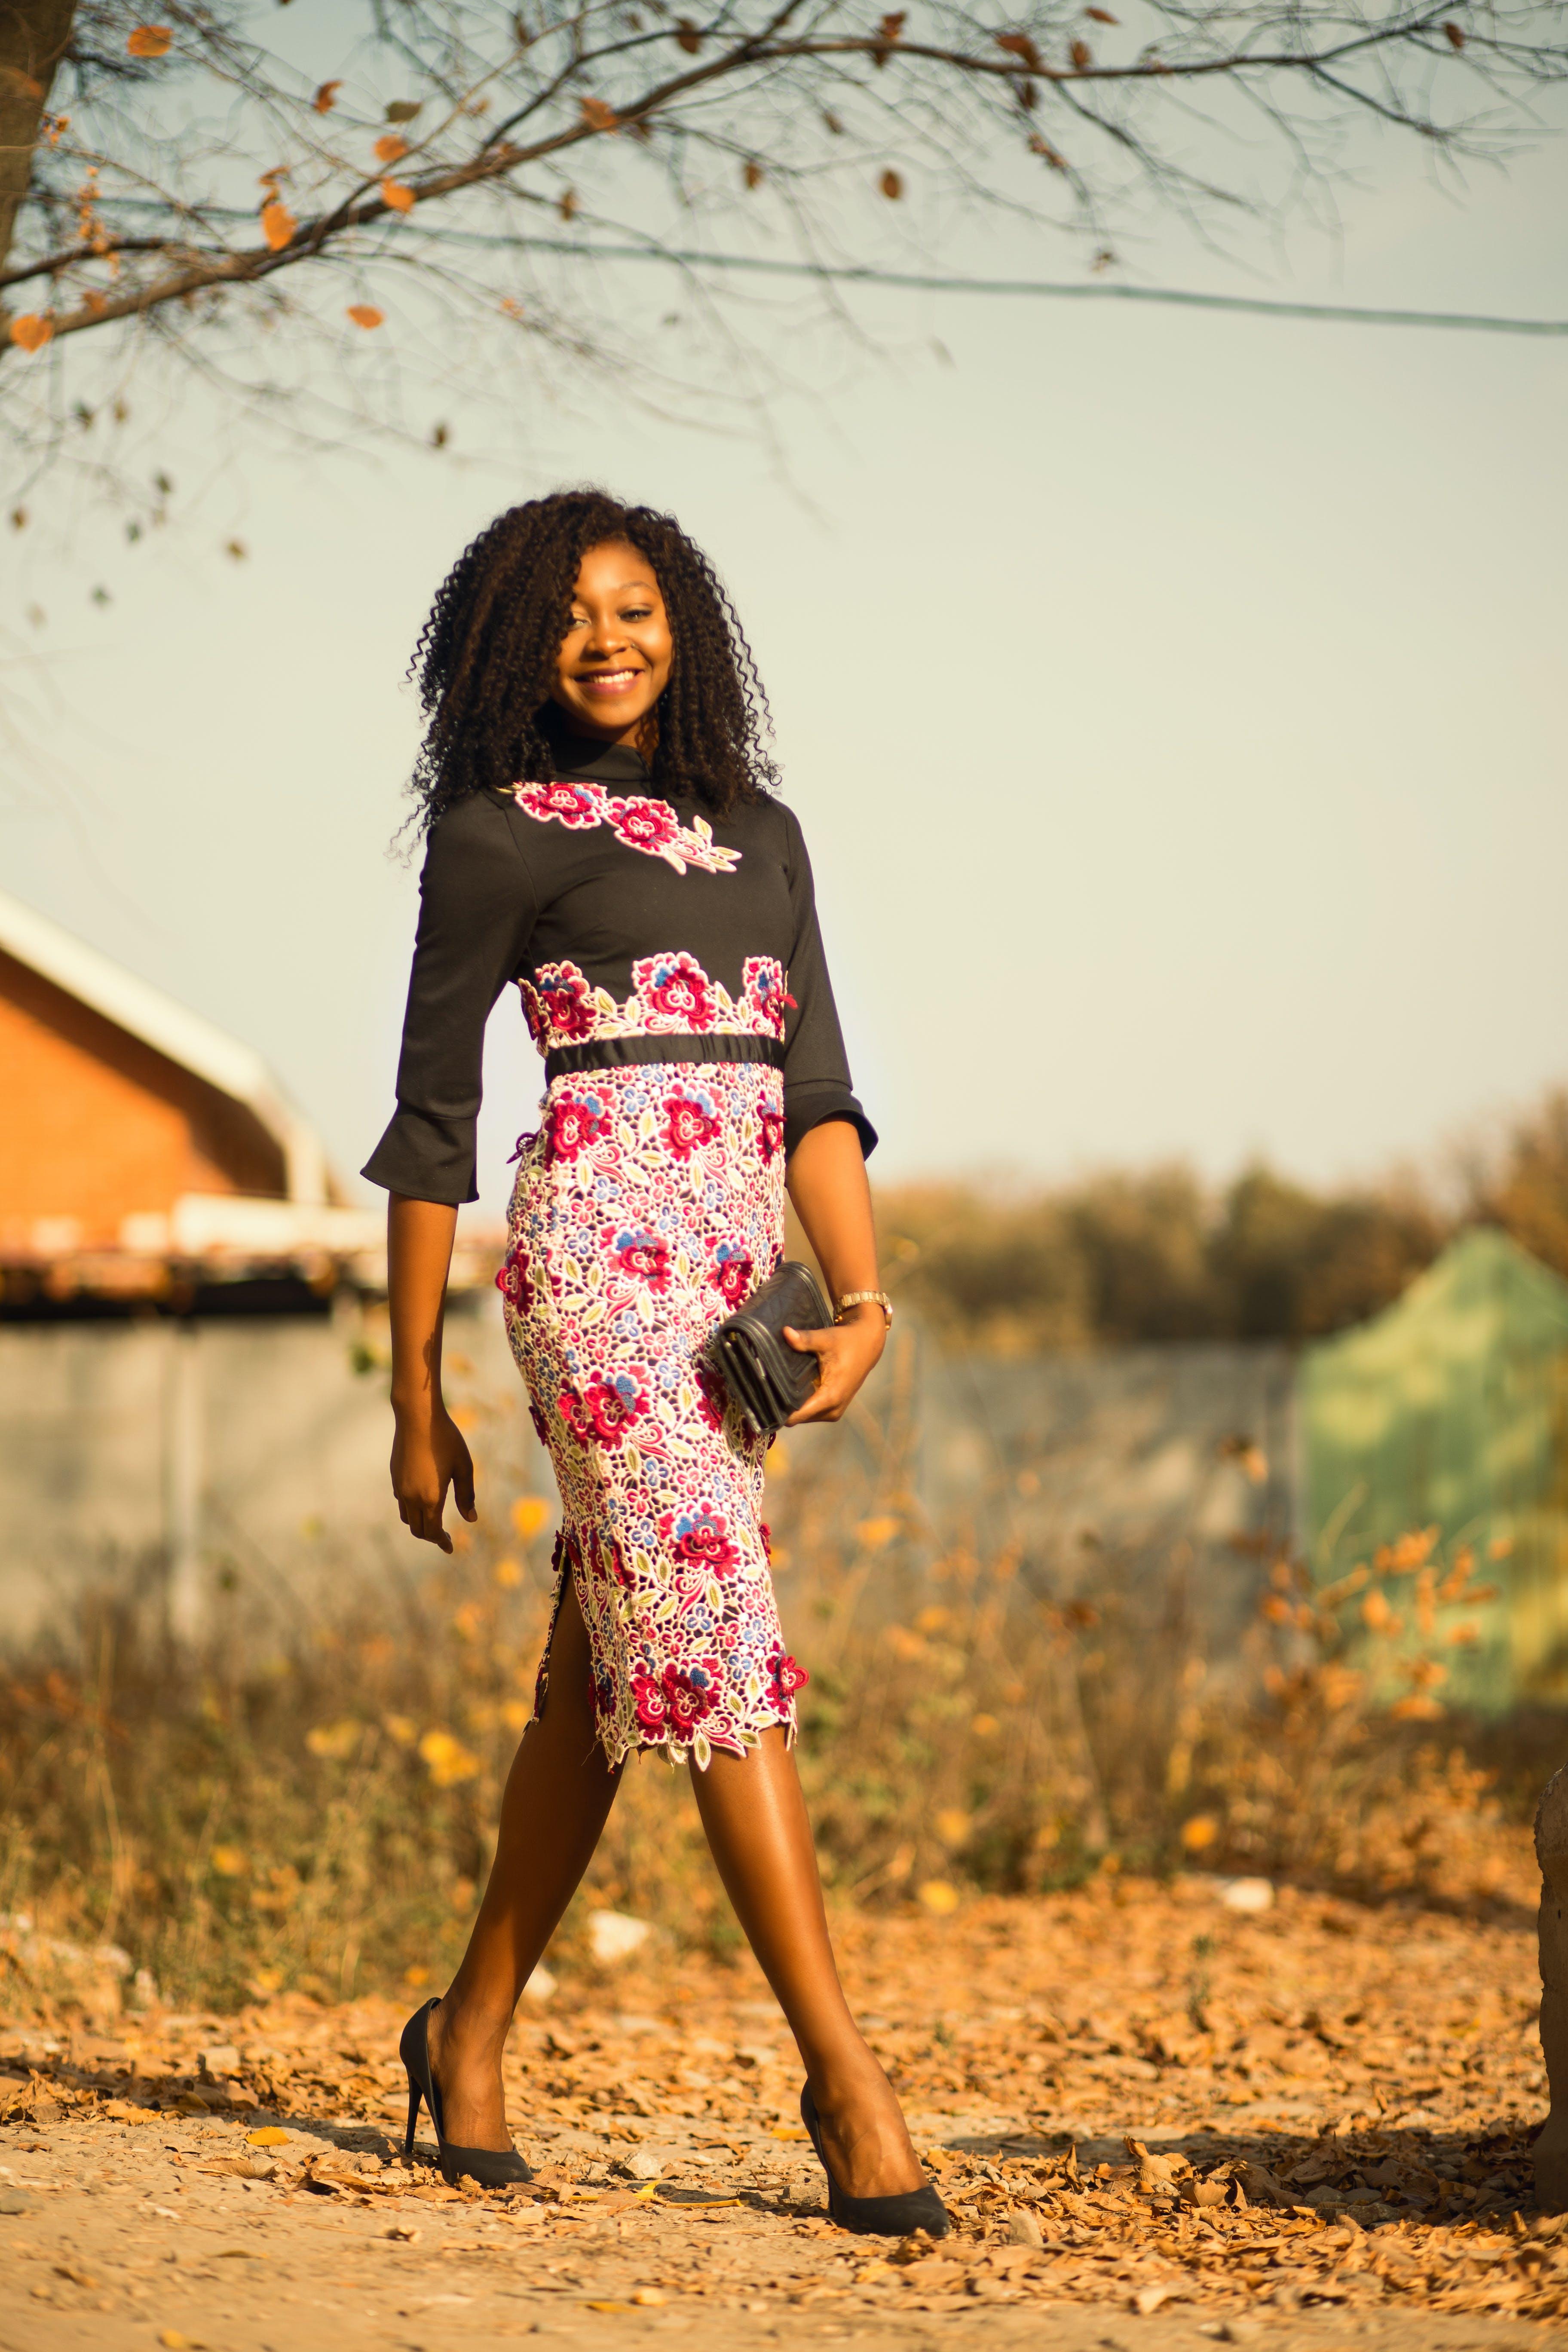 Kostenloses Stock Foto zu fashion, person, frau, gehen